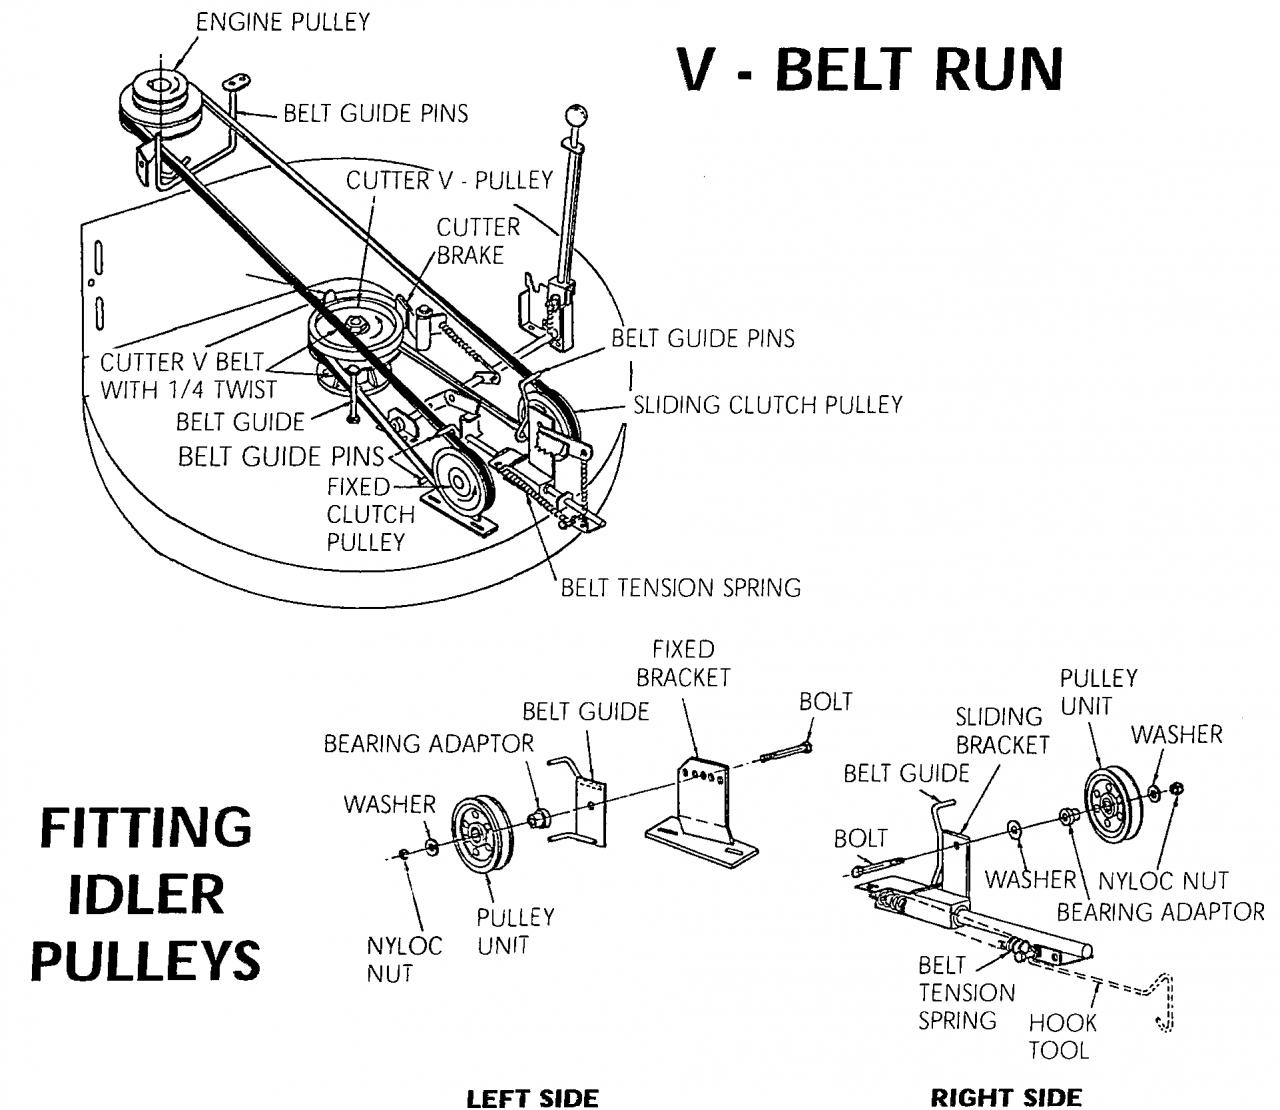 1978 honda ct70 wiring diagram lower back pain symptoms 1974 cb550 diagram. honda. auto